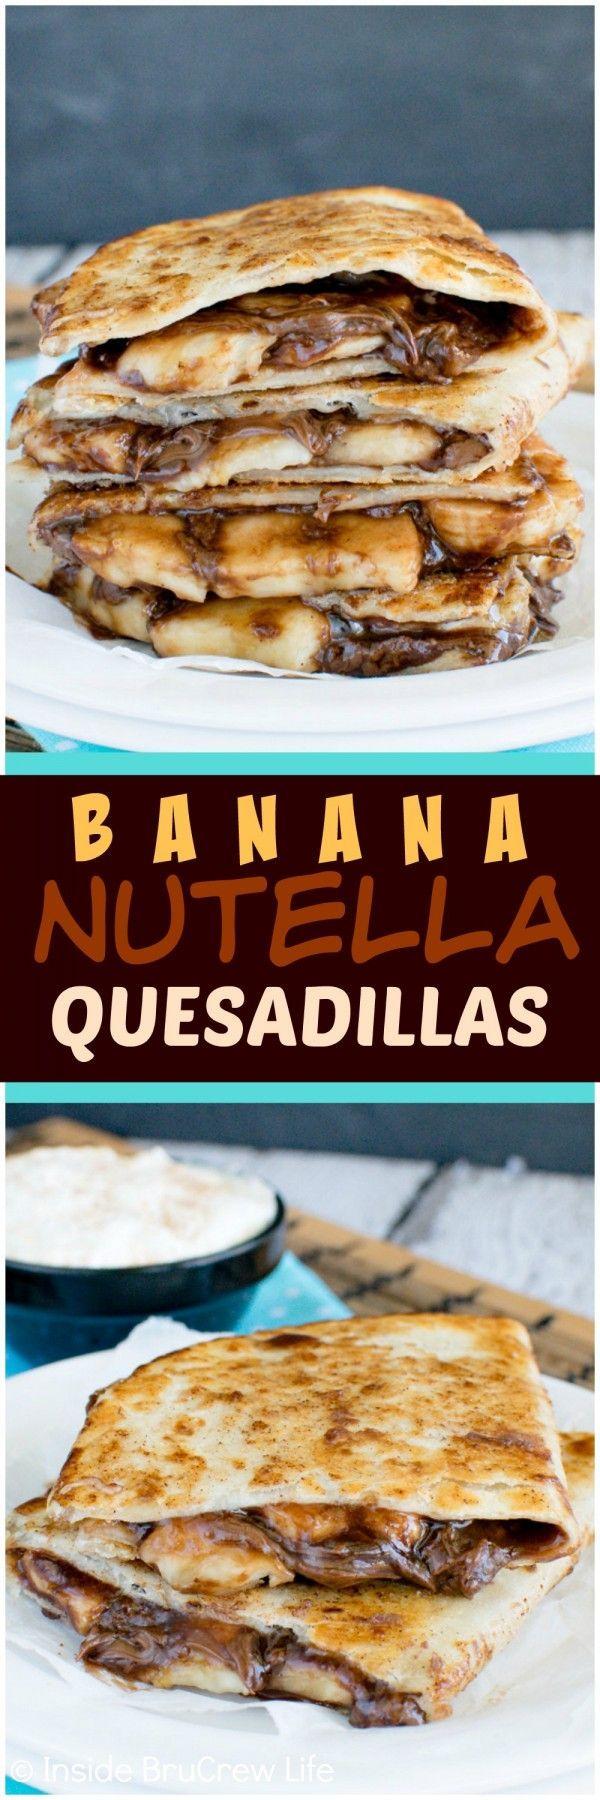 Banana Nutella Quesadillas - cinnamon sugar tortillas filled with banana slices and Nutella makes an awesome no bake dessert recipe!